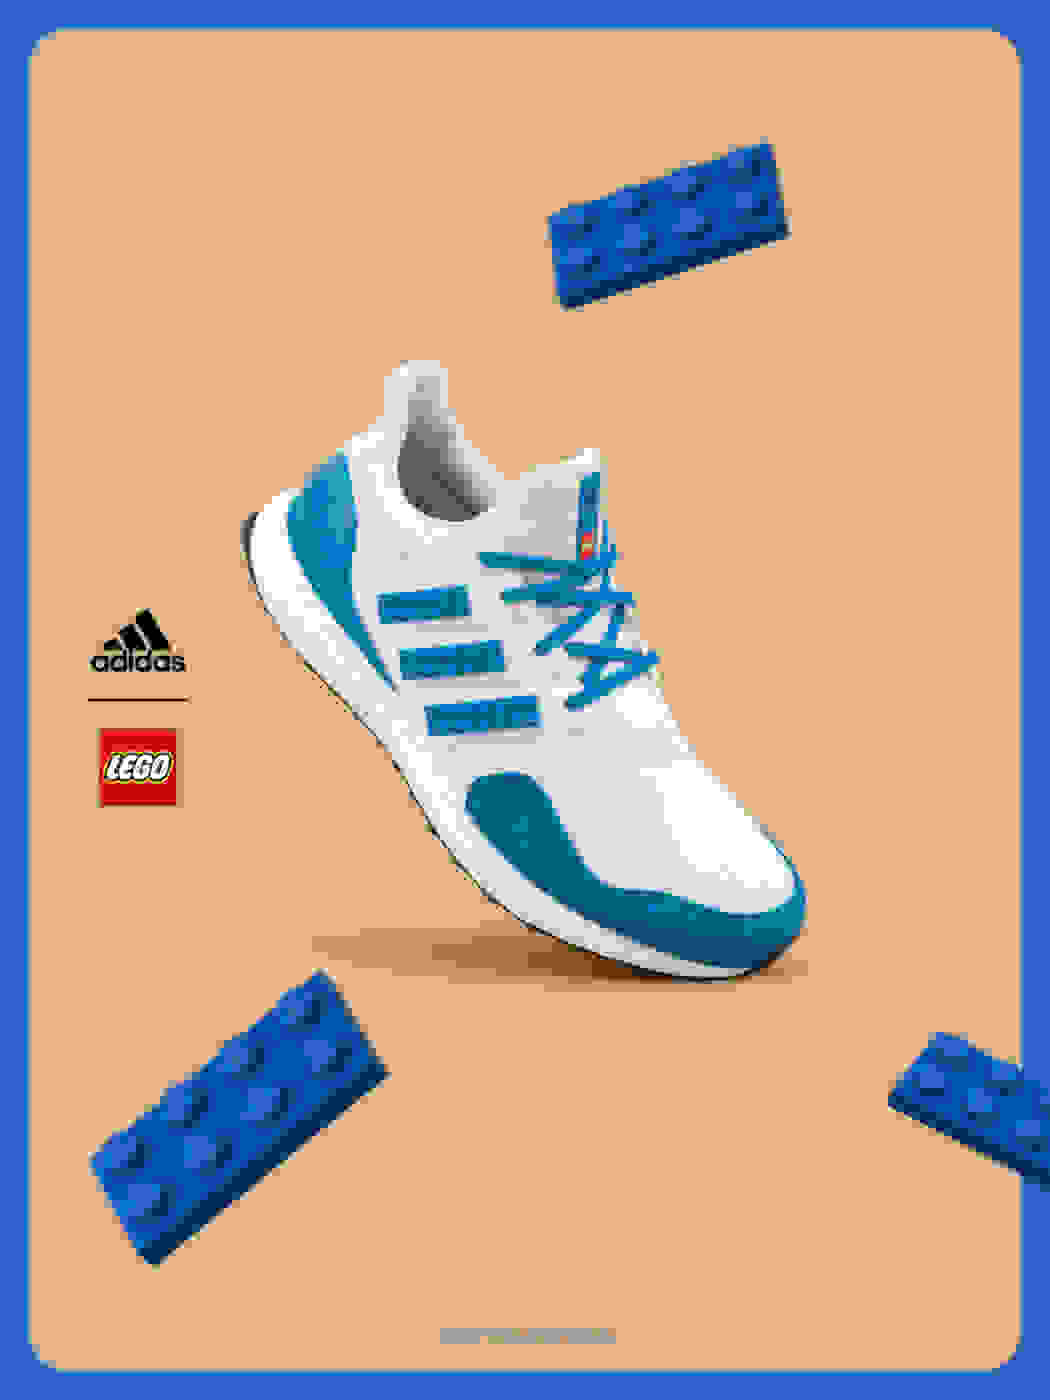 Blue color shoe on brown background